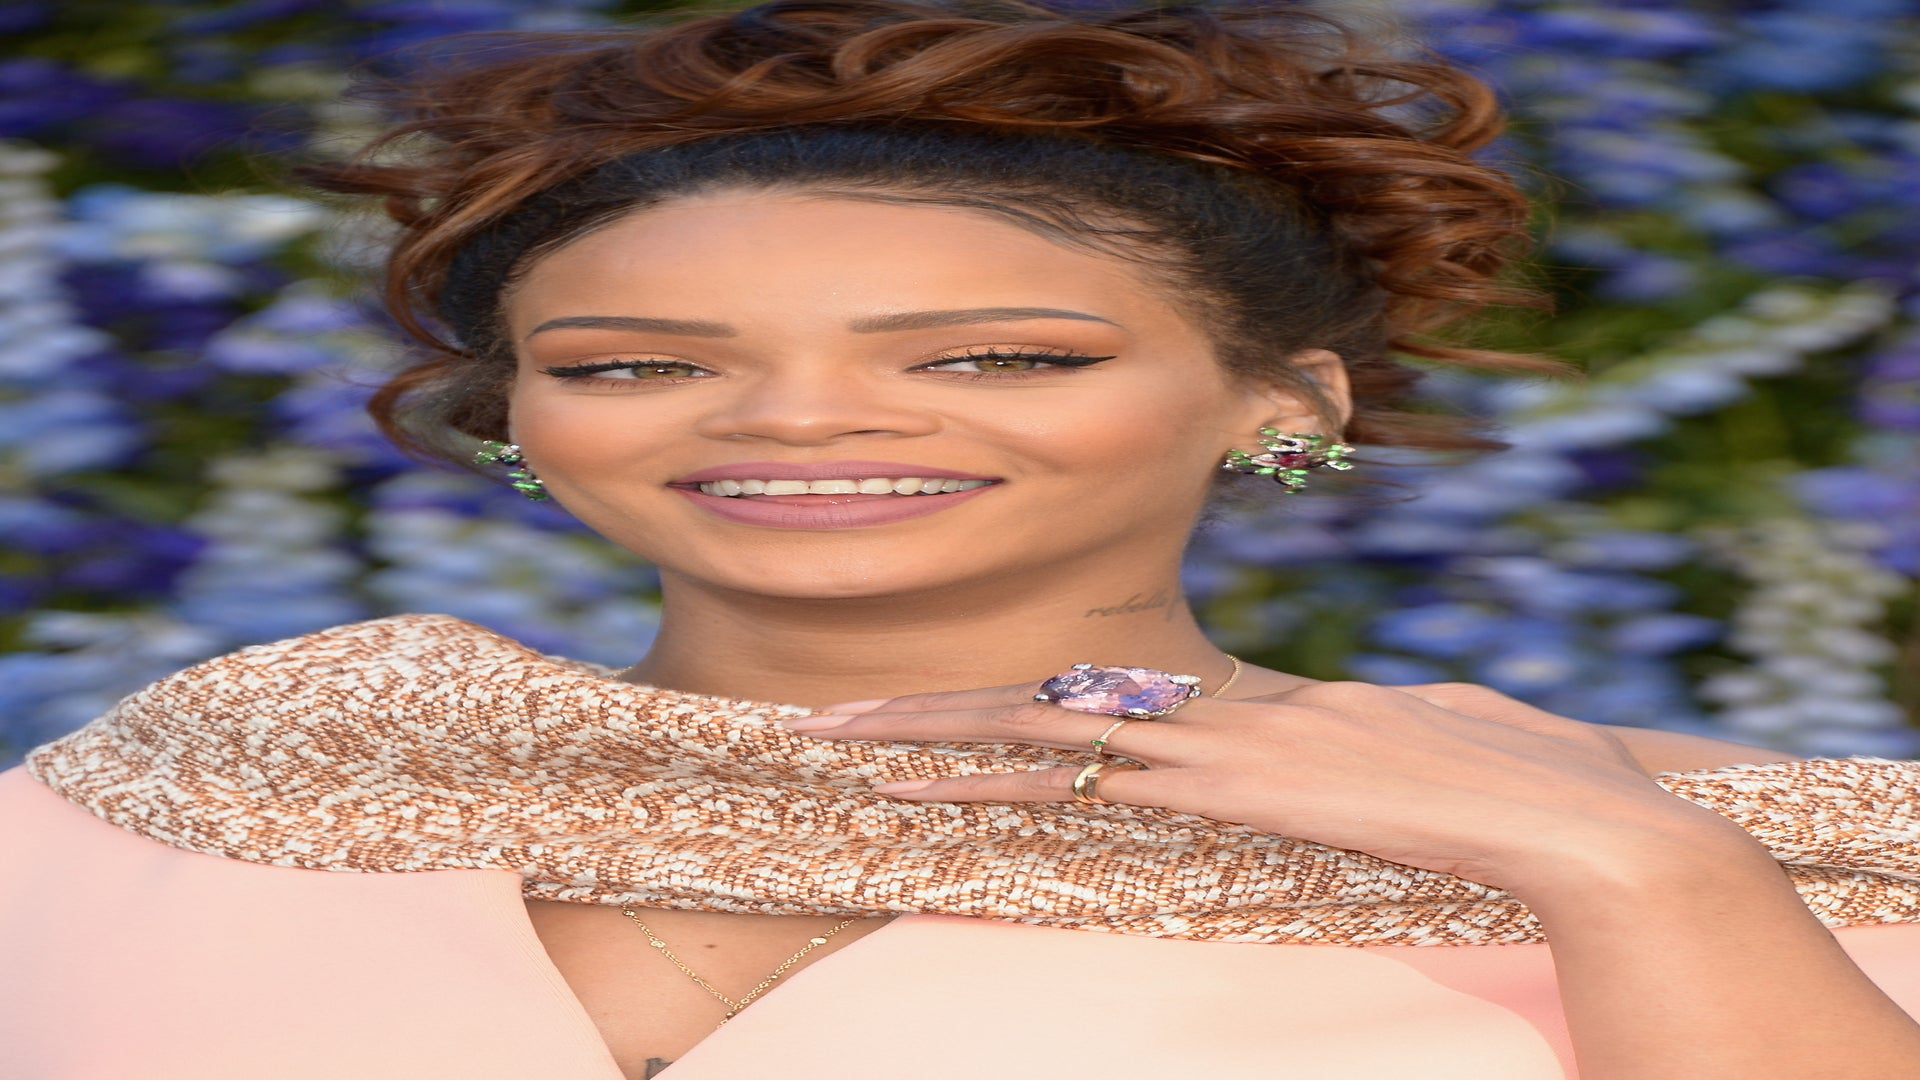 Rihanna Teams Up With Parsons and Donna Karan to Benefit Haitian Artisans